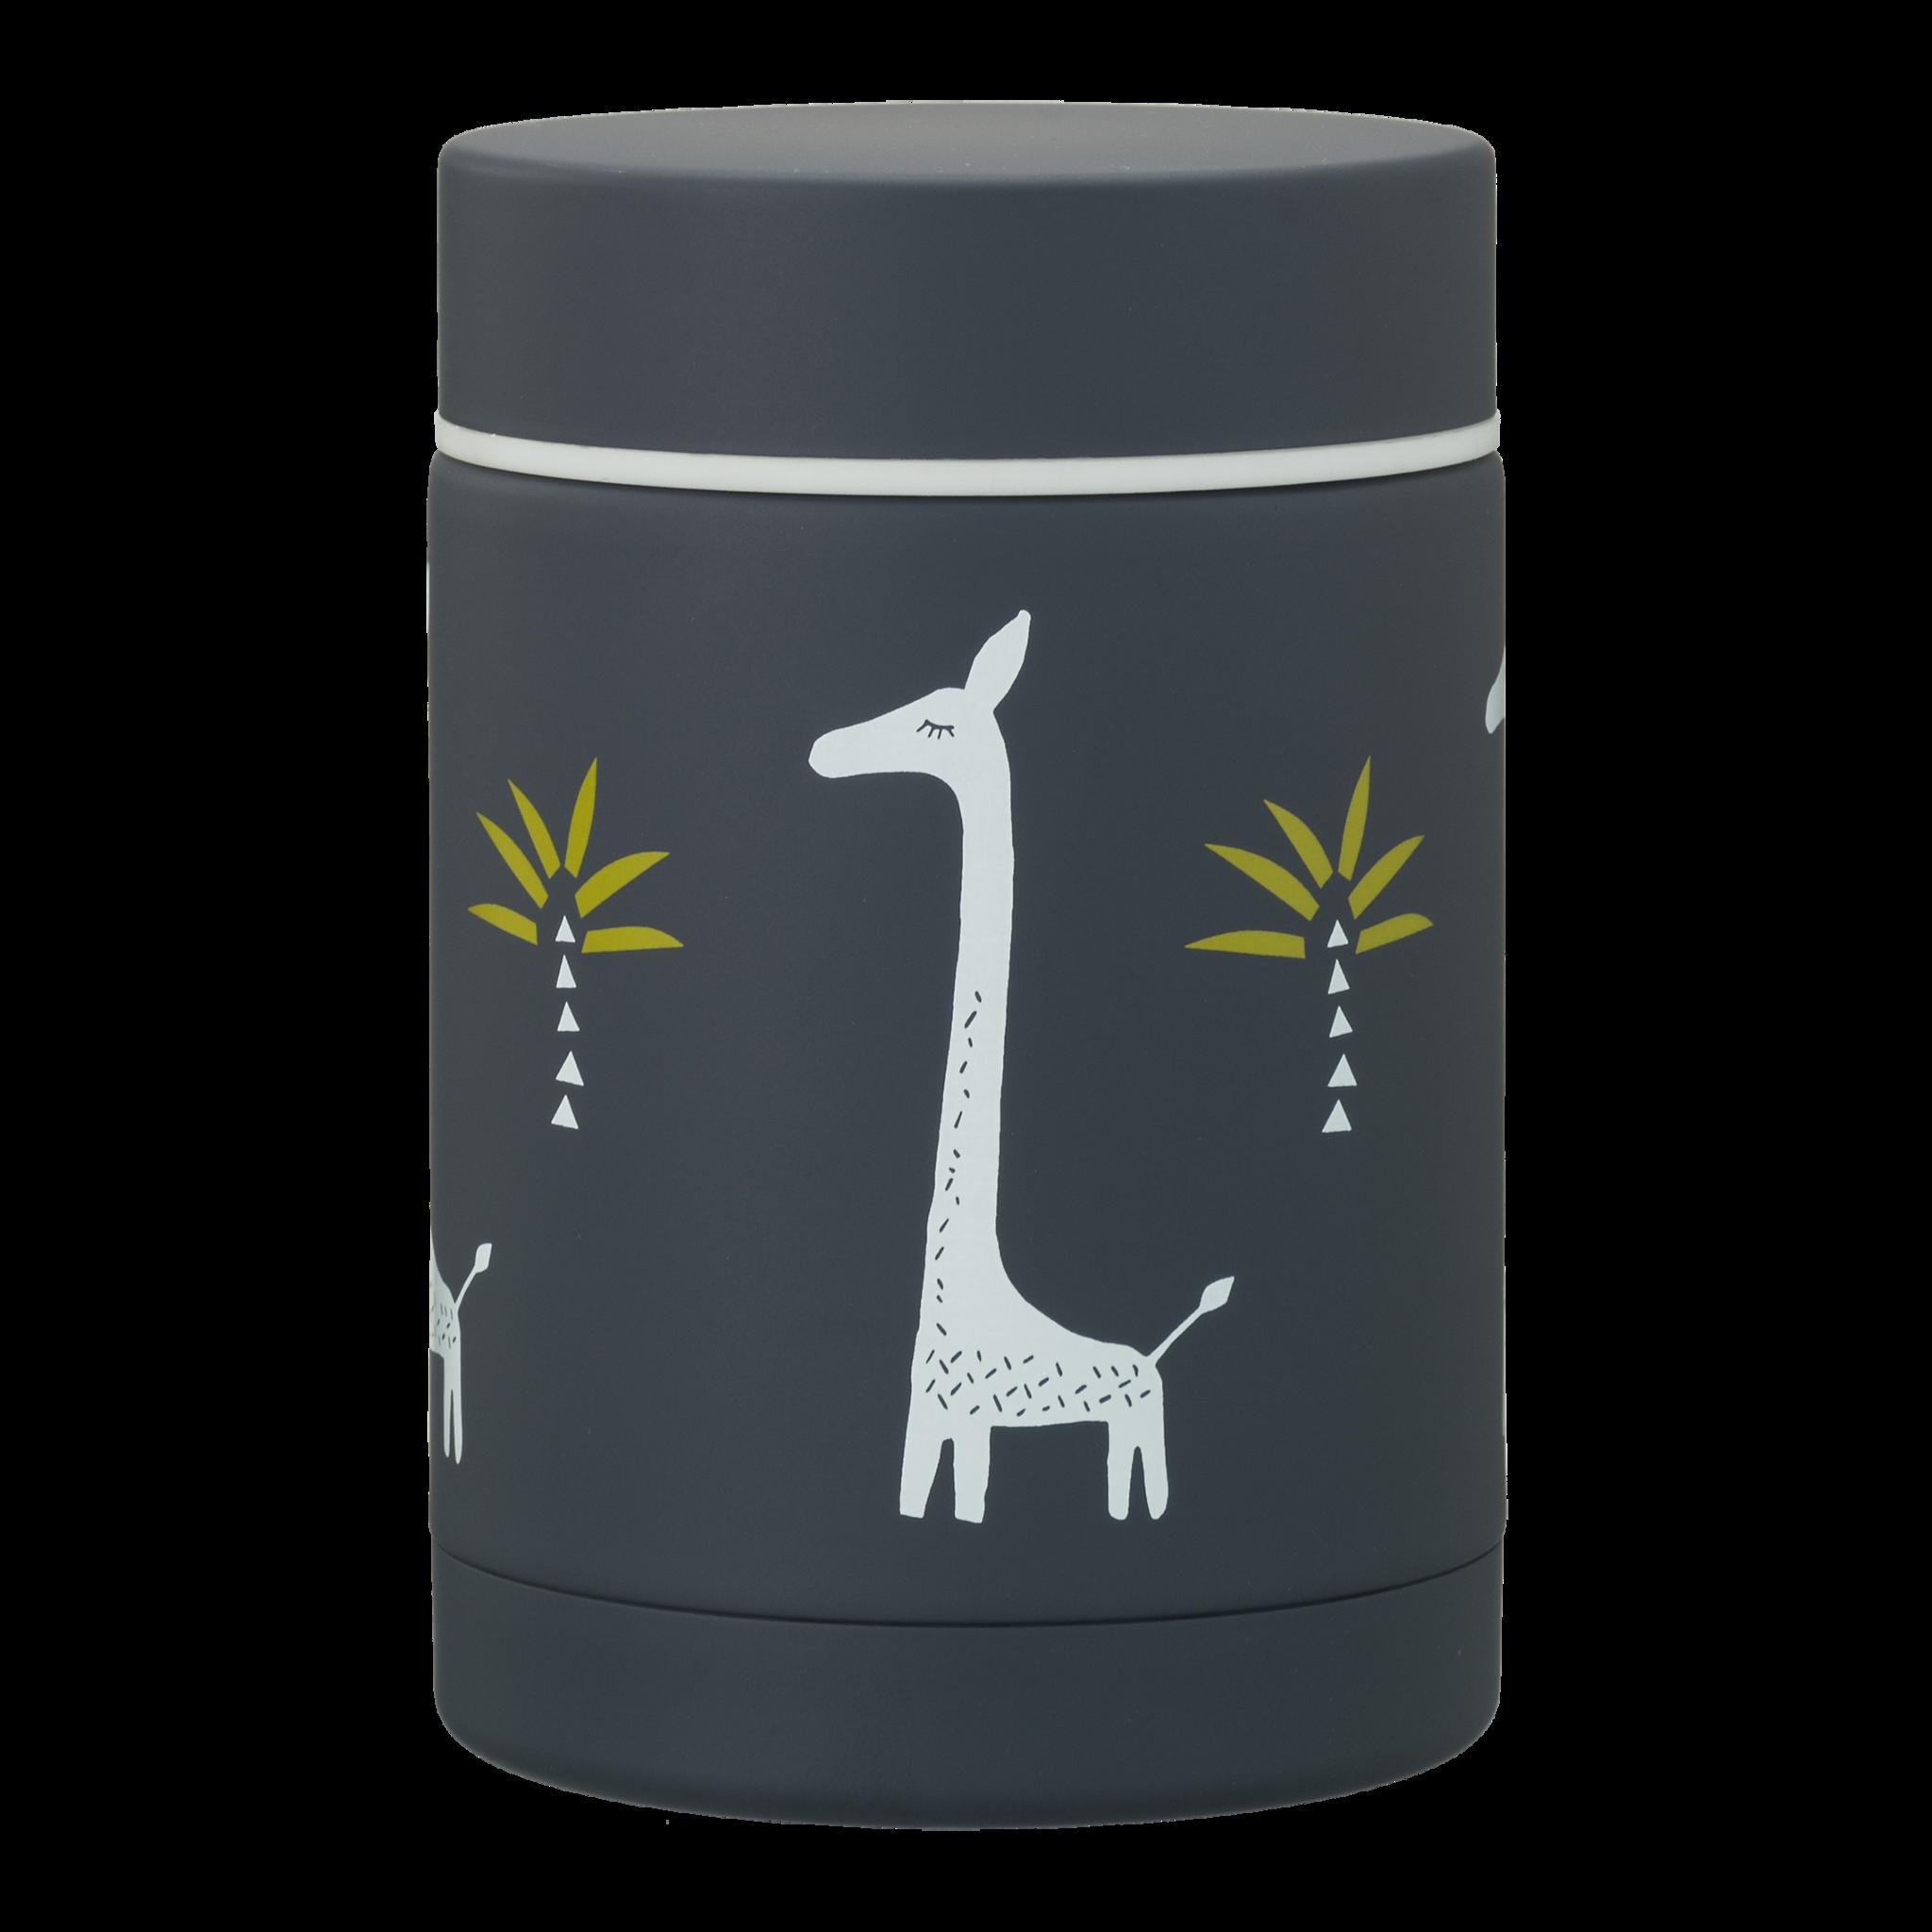 Fresk Thermobehälter 300ml Giraffe